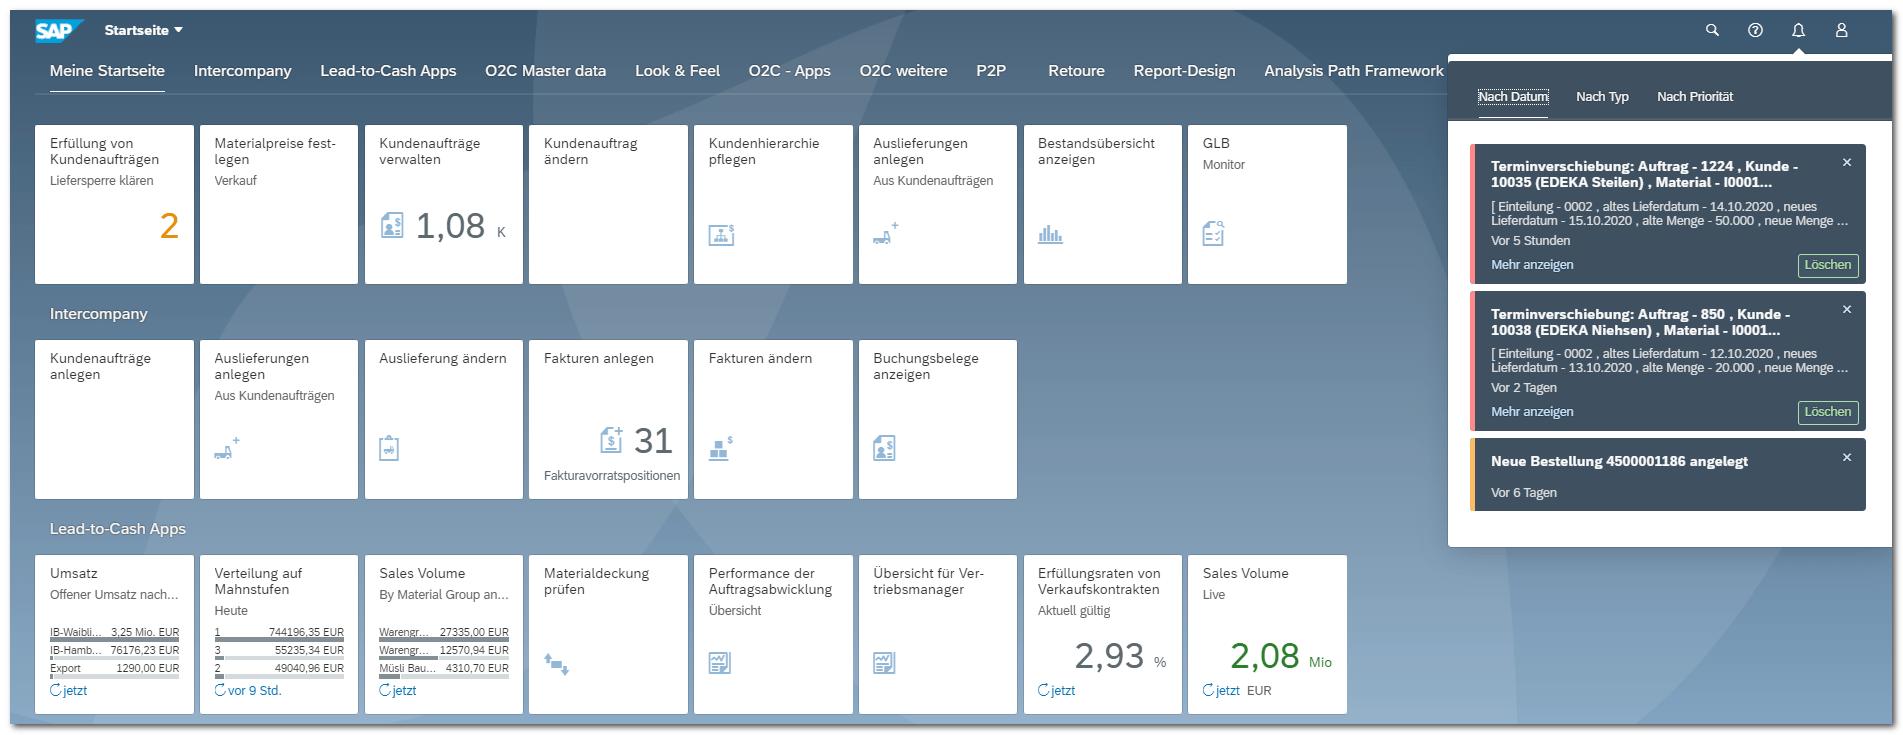 Blog Screen Sales Fiori Notifications Highlights S4HANA - Die besten Apps aus 5 Jahren SAP S/4HANA – Teil 4: Vertrieb